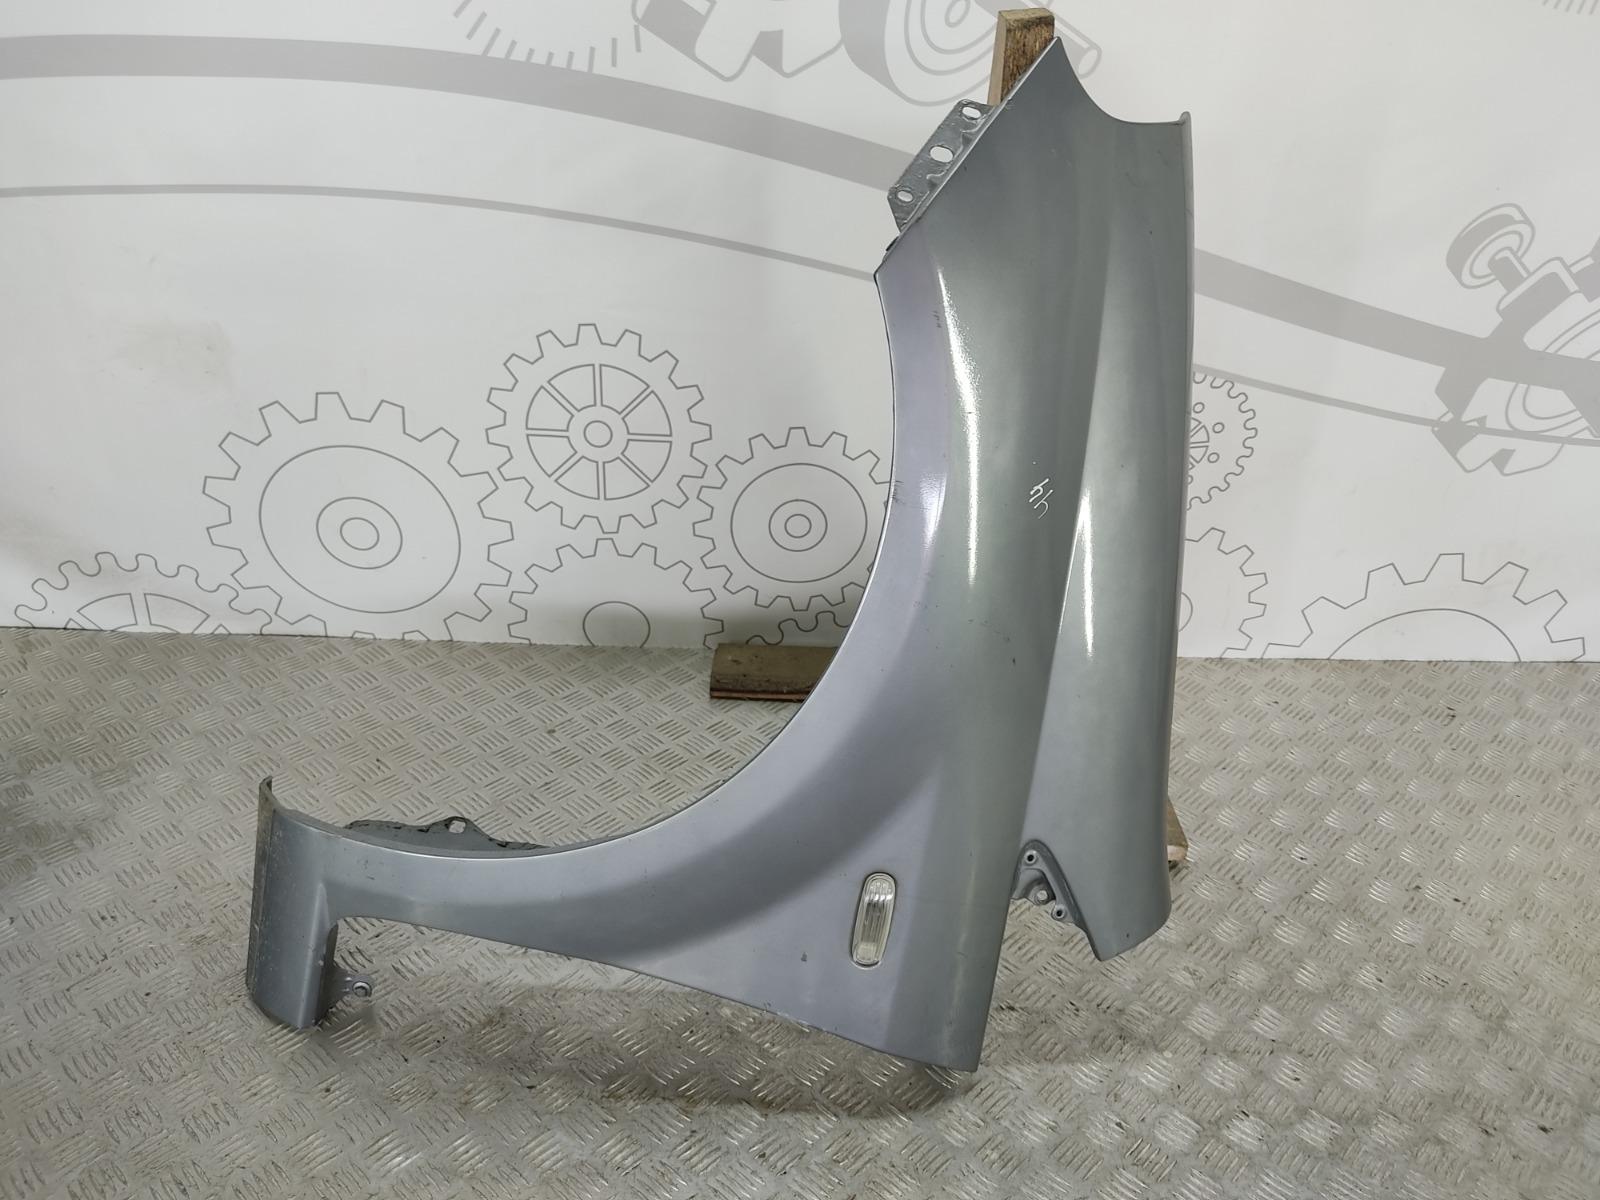 Крыло переднее левое Fiat Punto 1.4 I 2011 (б/у)